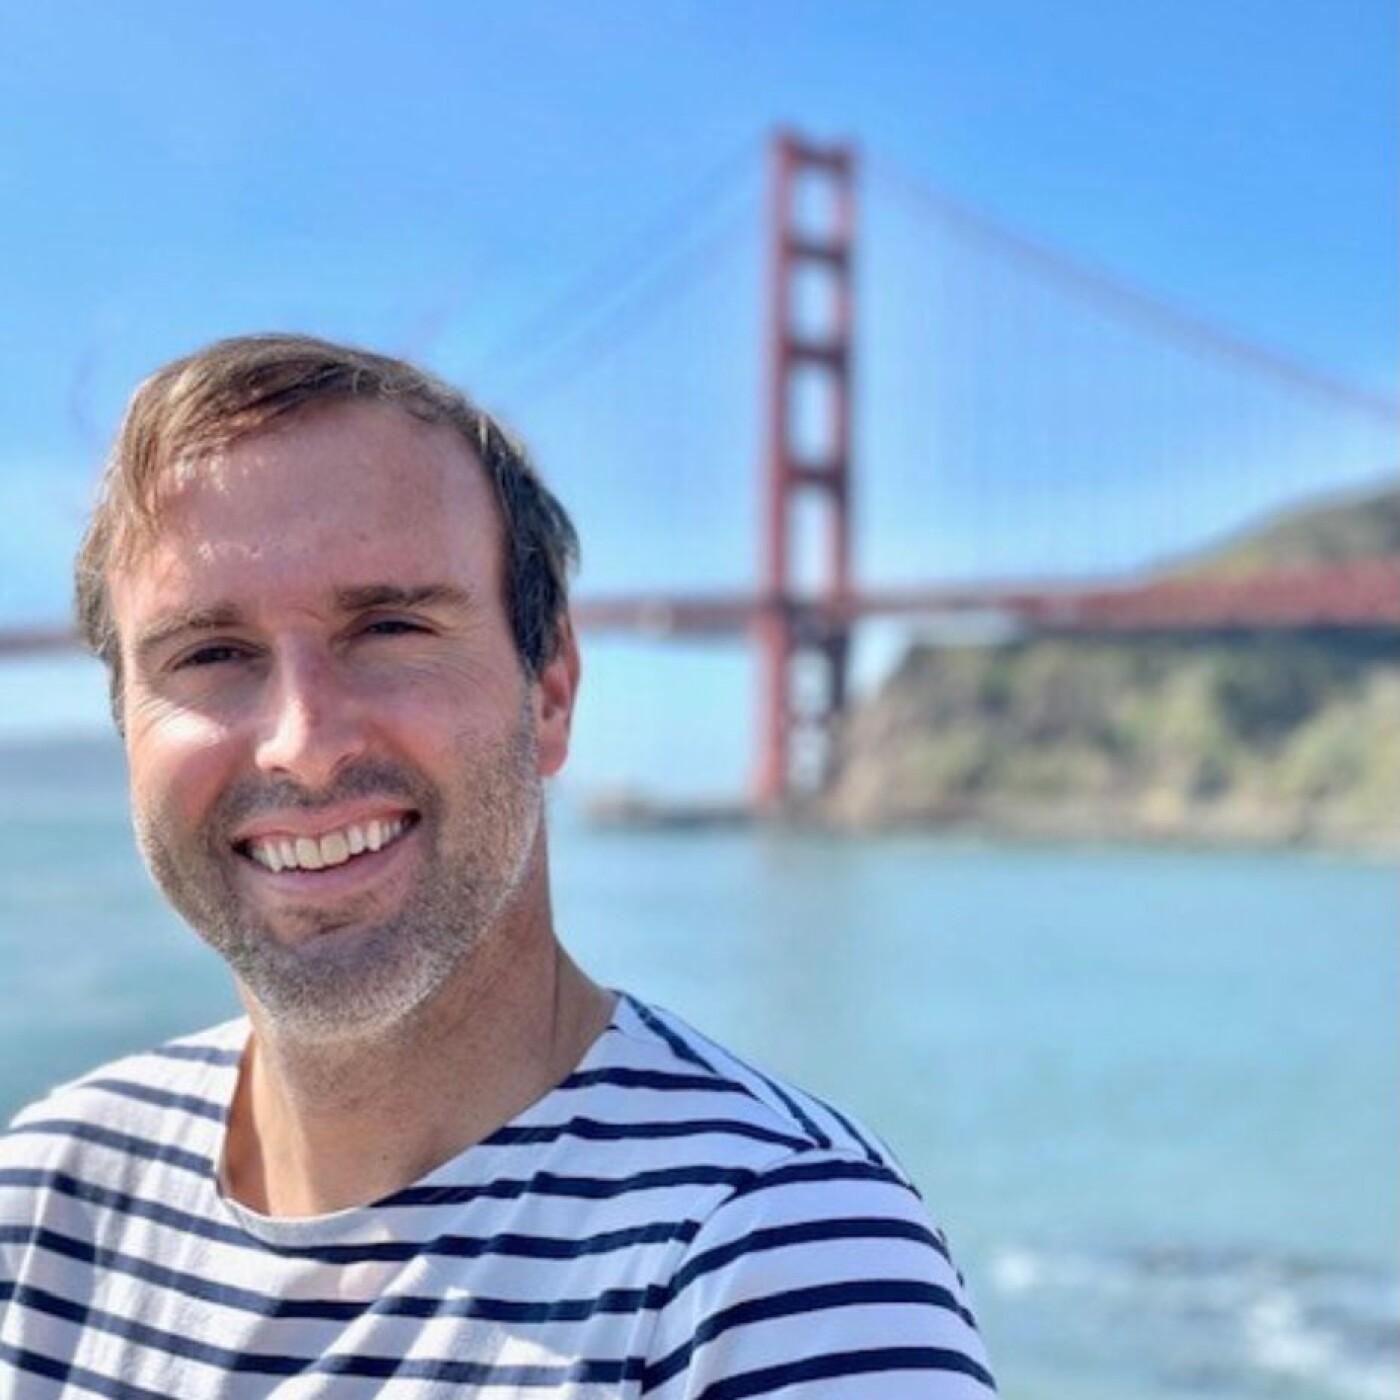 Pierre organise Lapero à San Francisco, USA - 08 07 2021 - StereoChic Radio